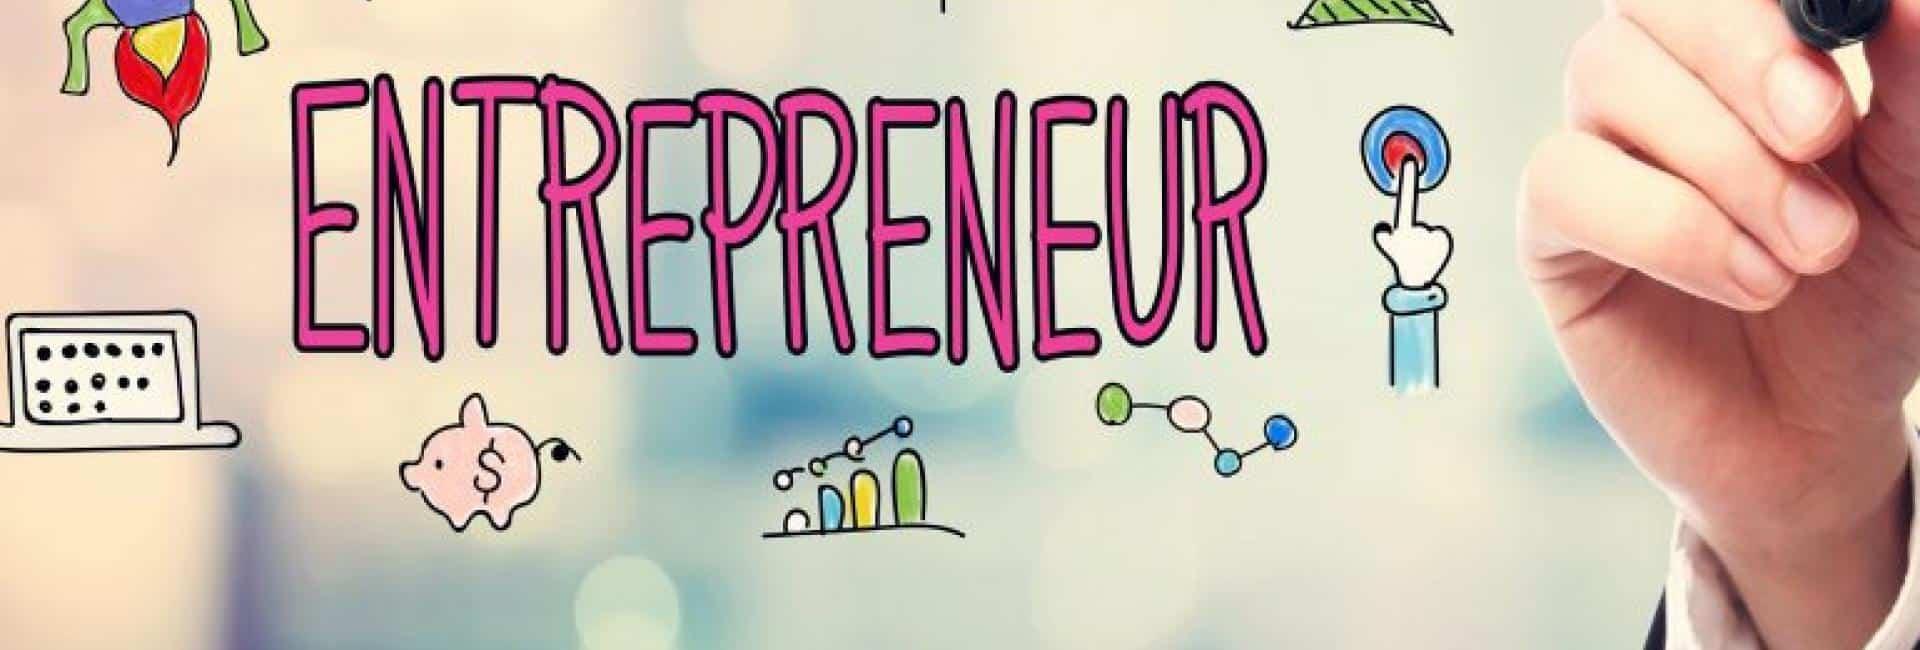 blog de antreprenor